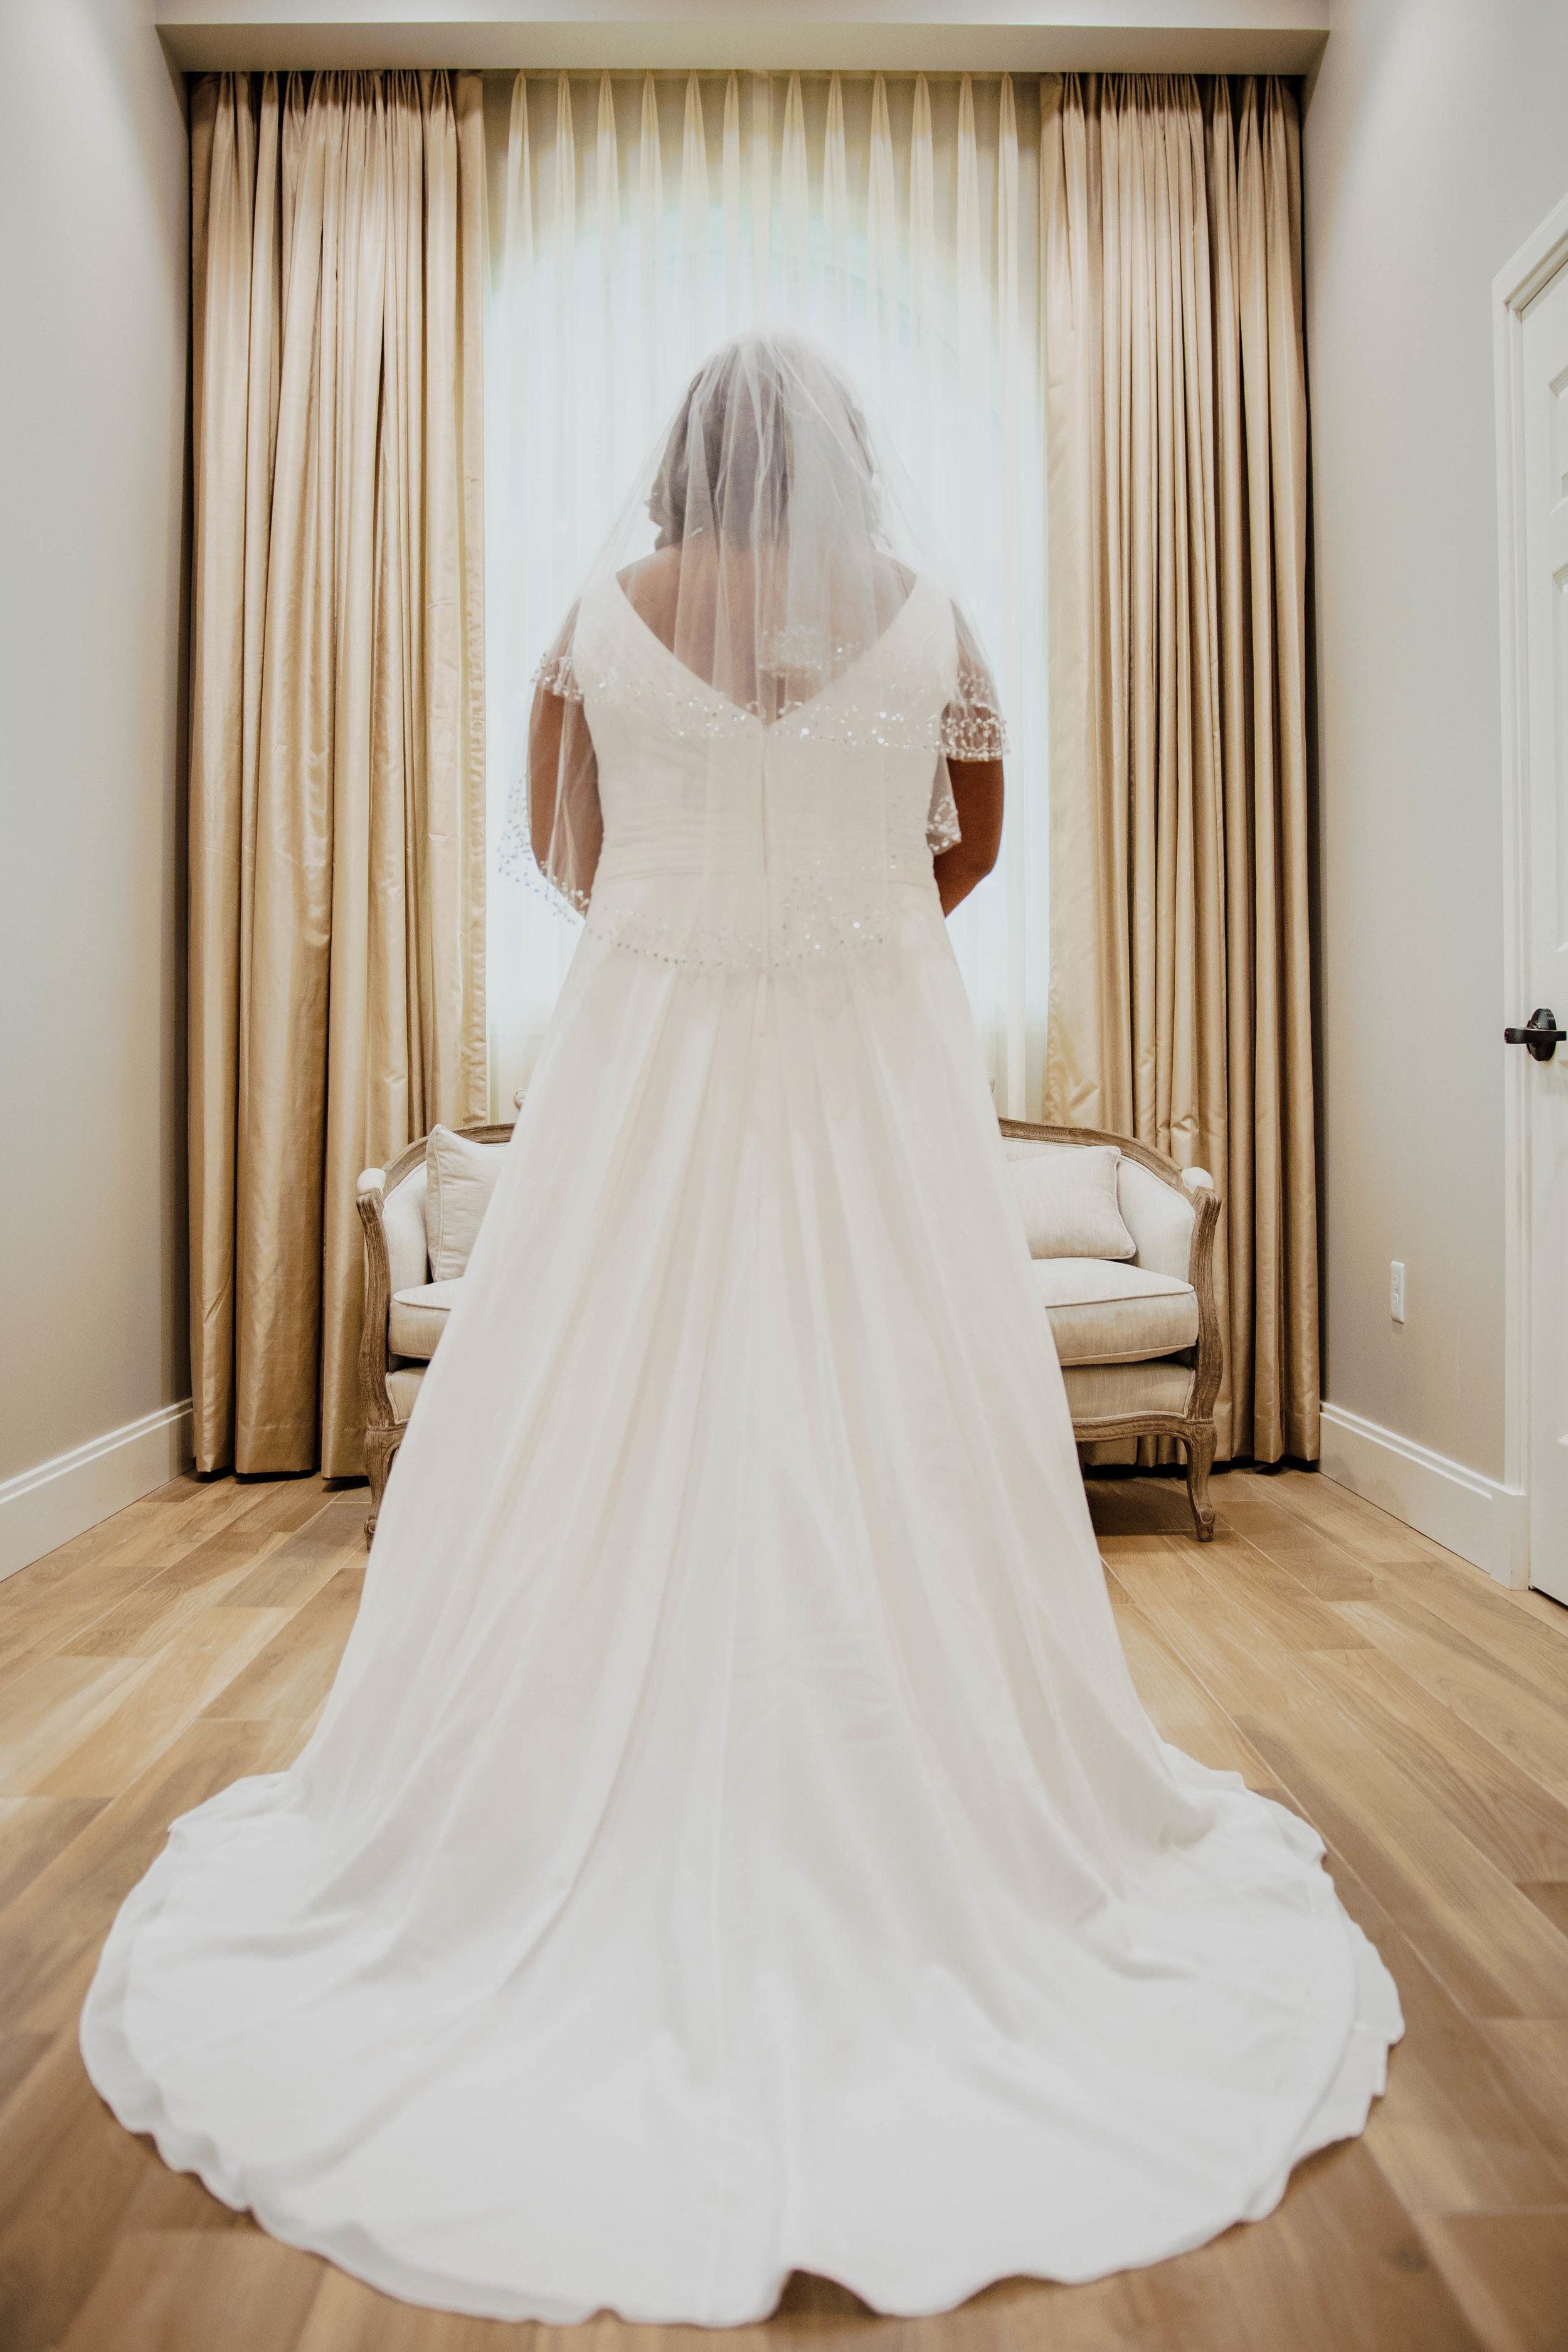 McNeile_Photography_Wedding_Tampa24.jpg